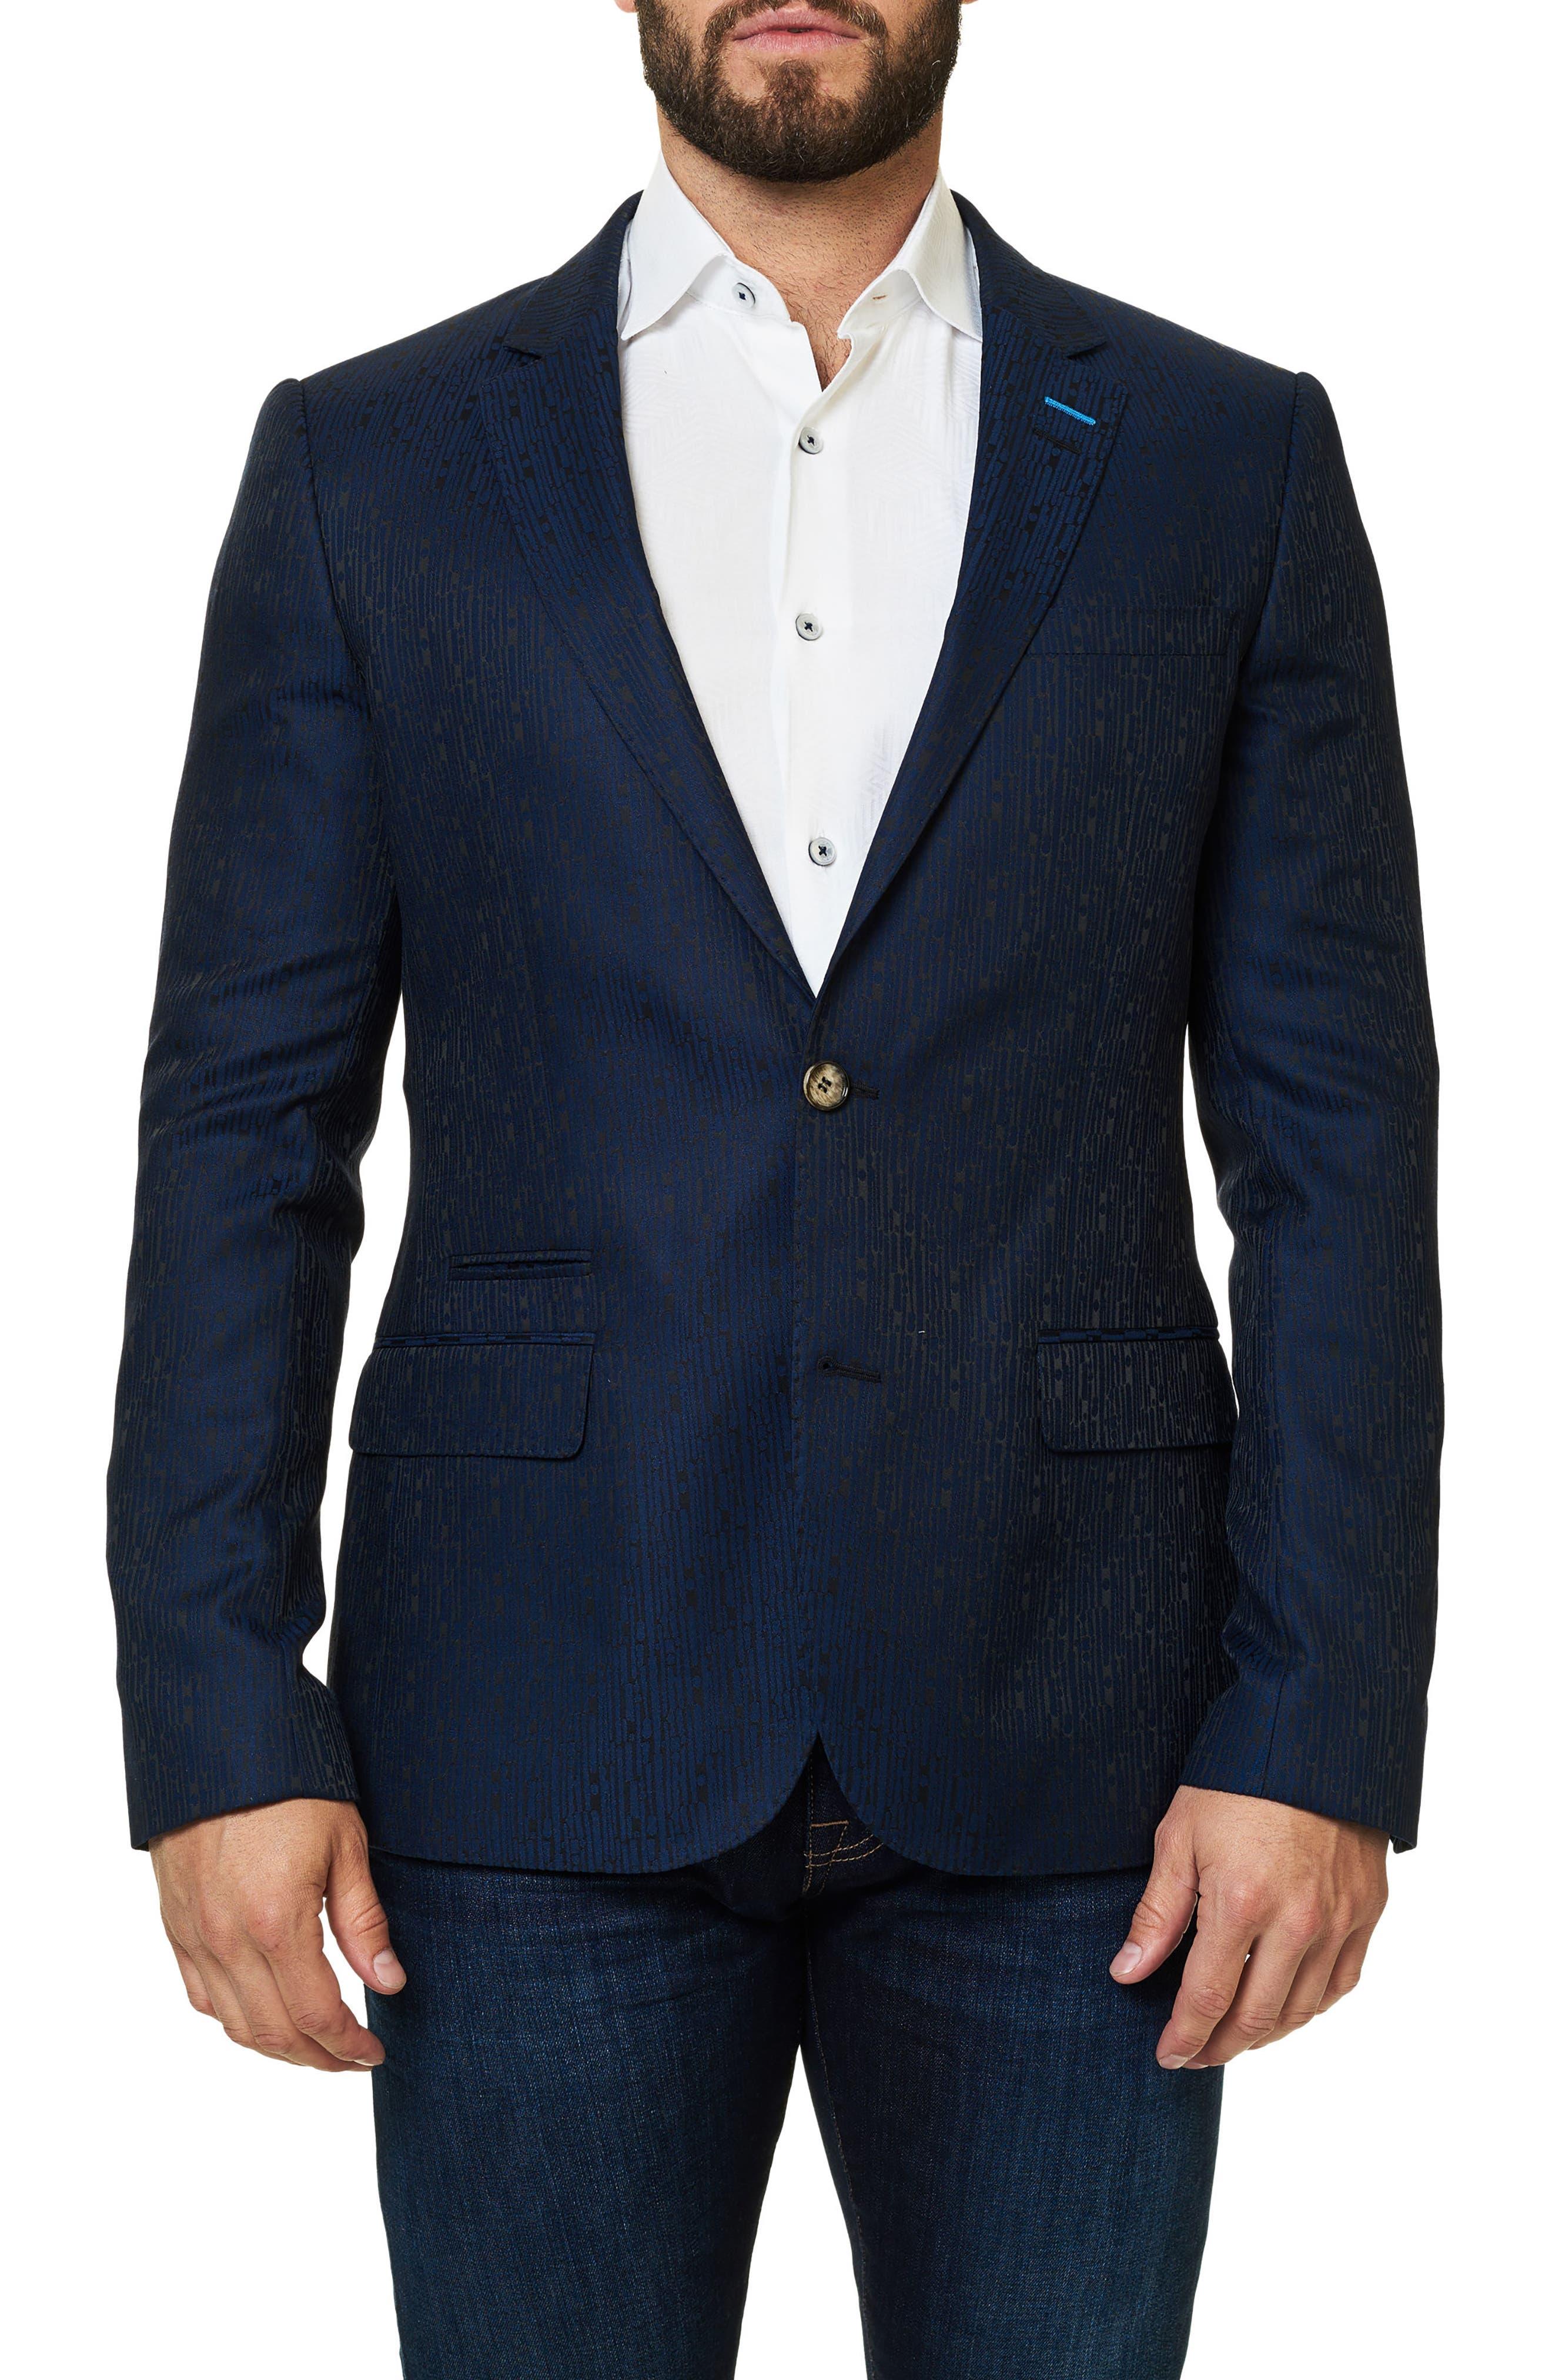 Alternate Image 1 Selected - Maceoo Socrate Jacquard Sport Coat